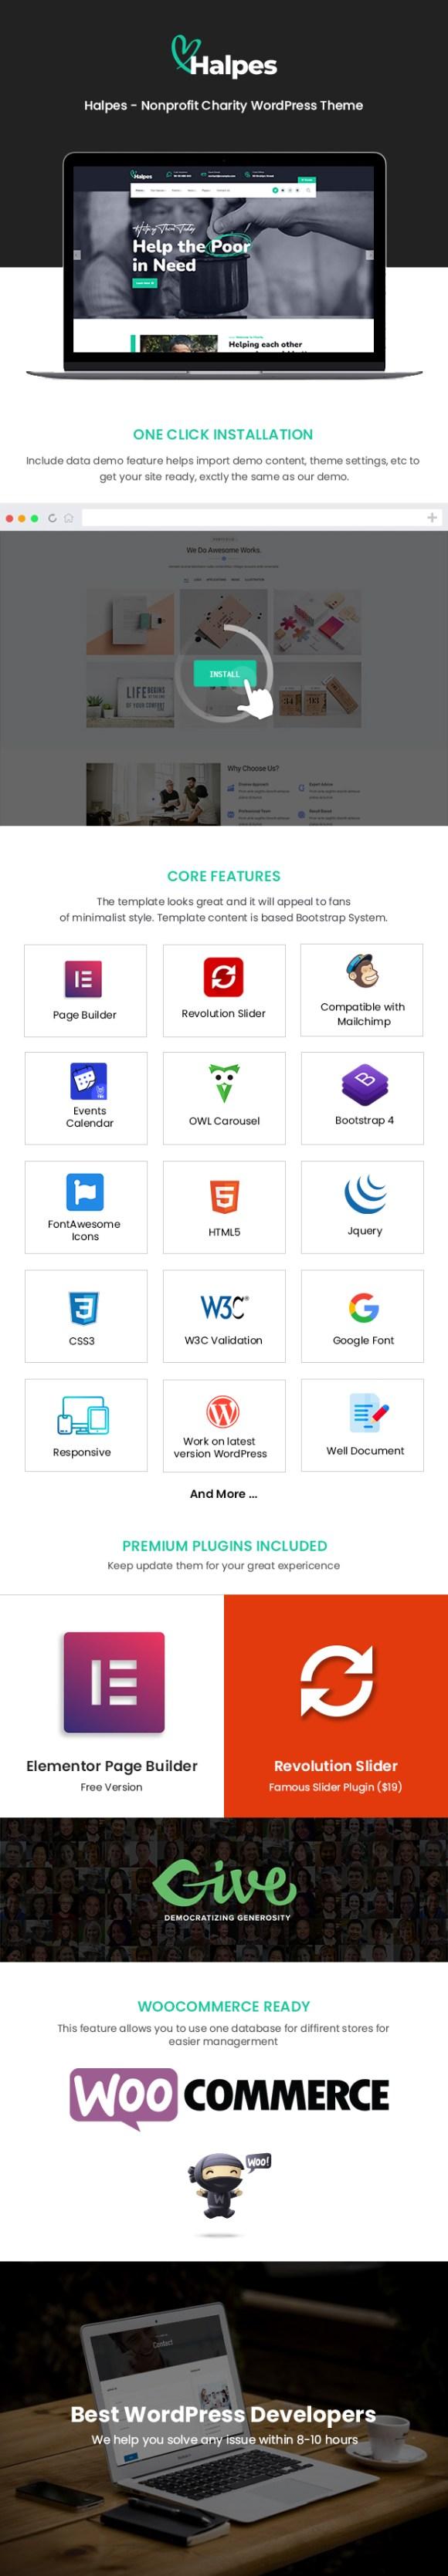 Halpes WordPress Theme